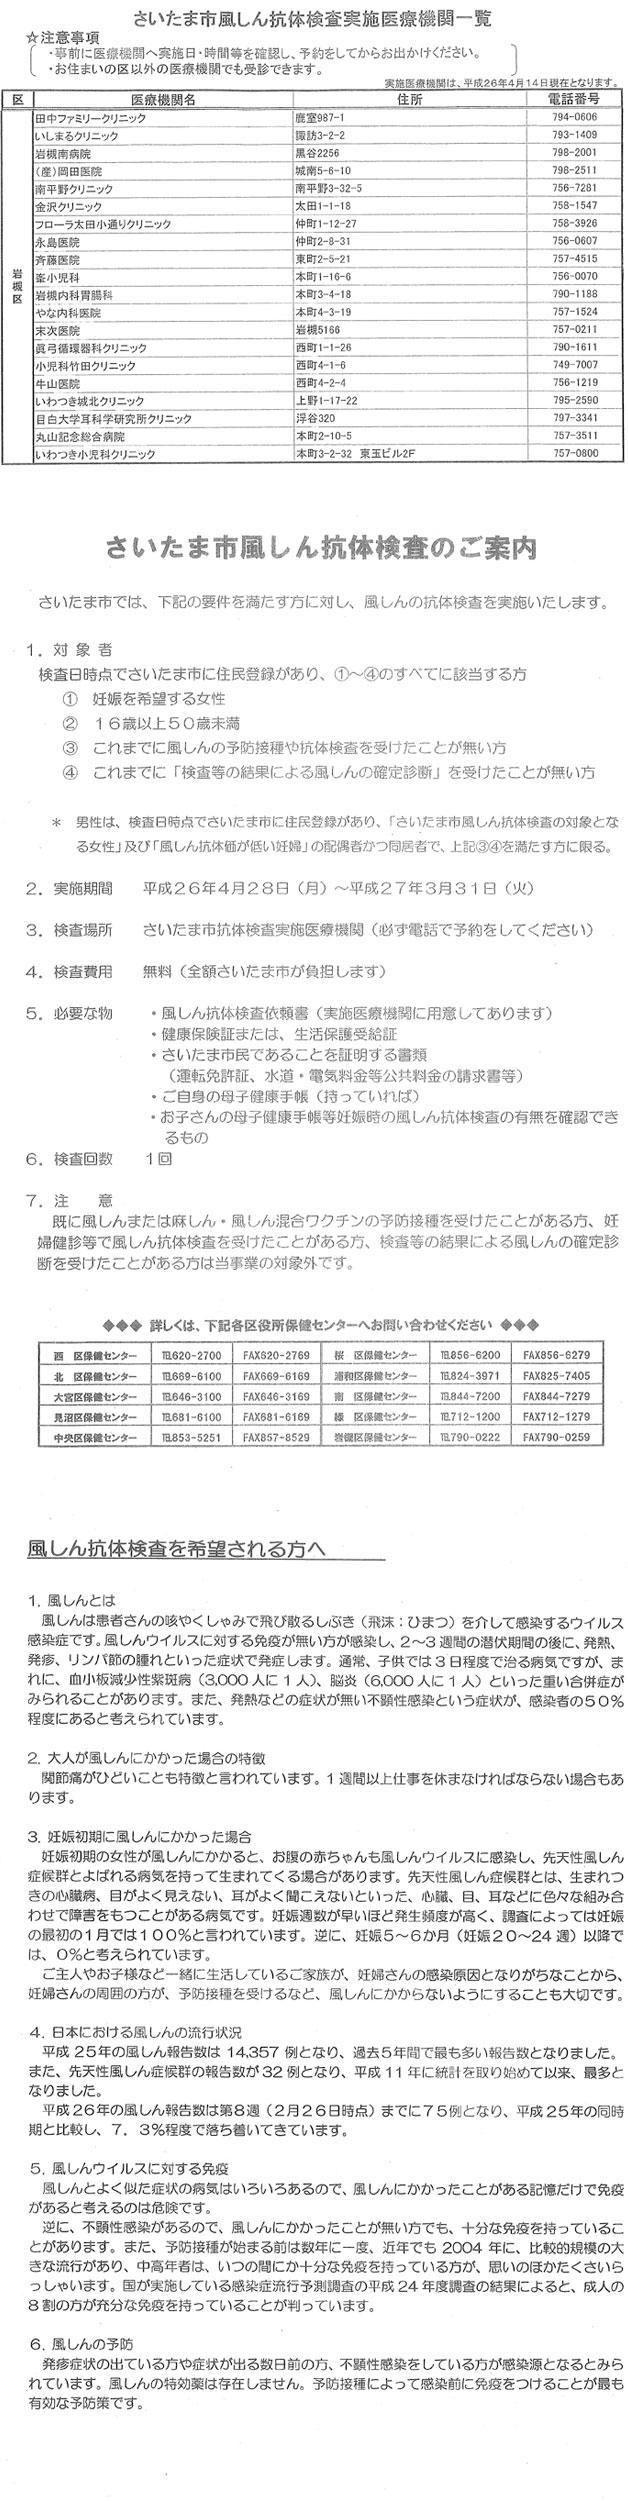 news20140625